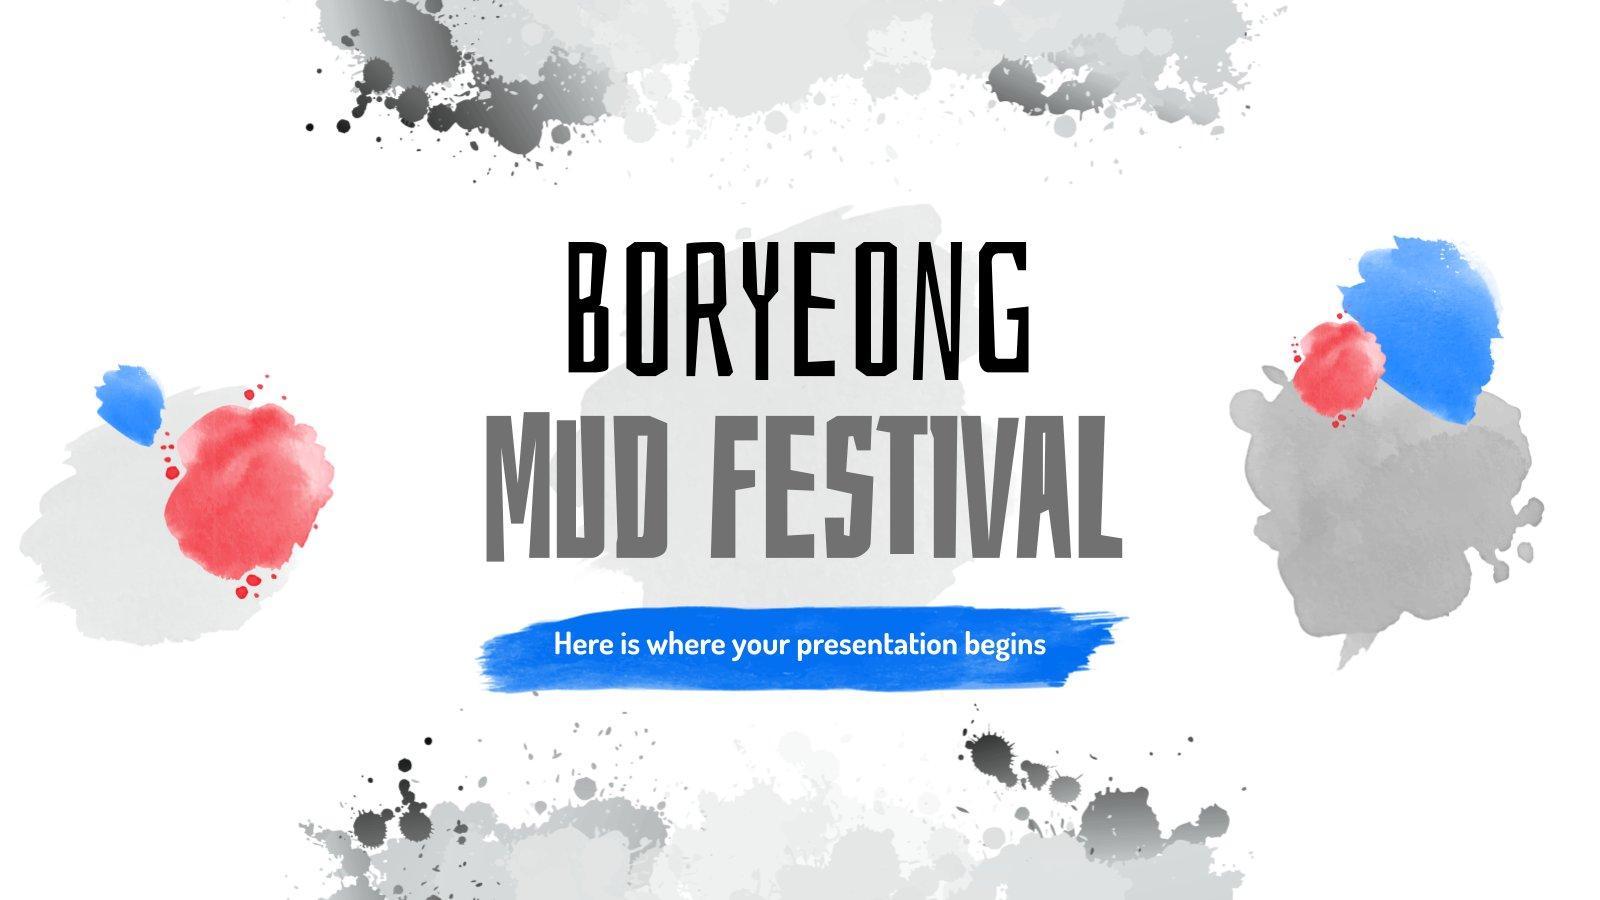 Schlammfestival Boryeong Präsentationsvorlage